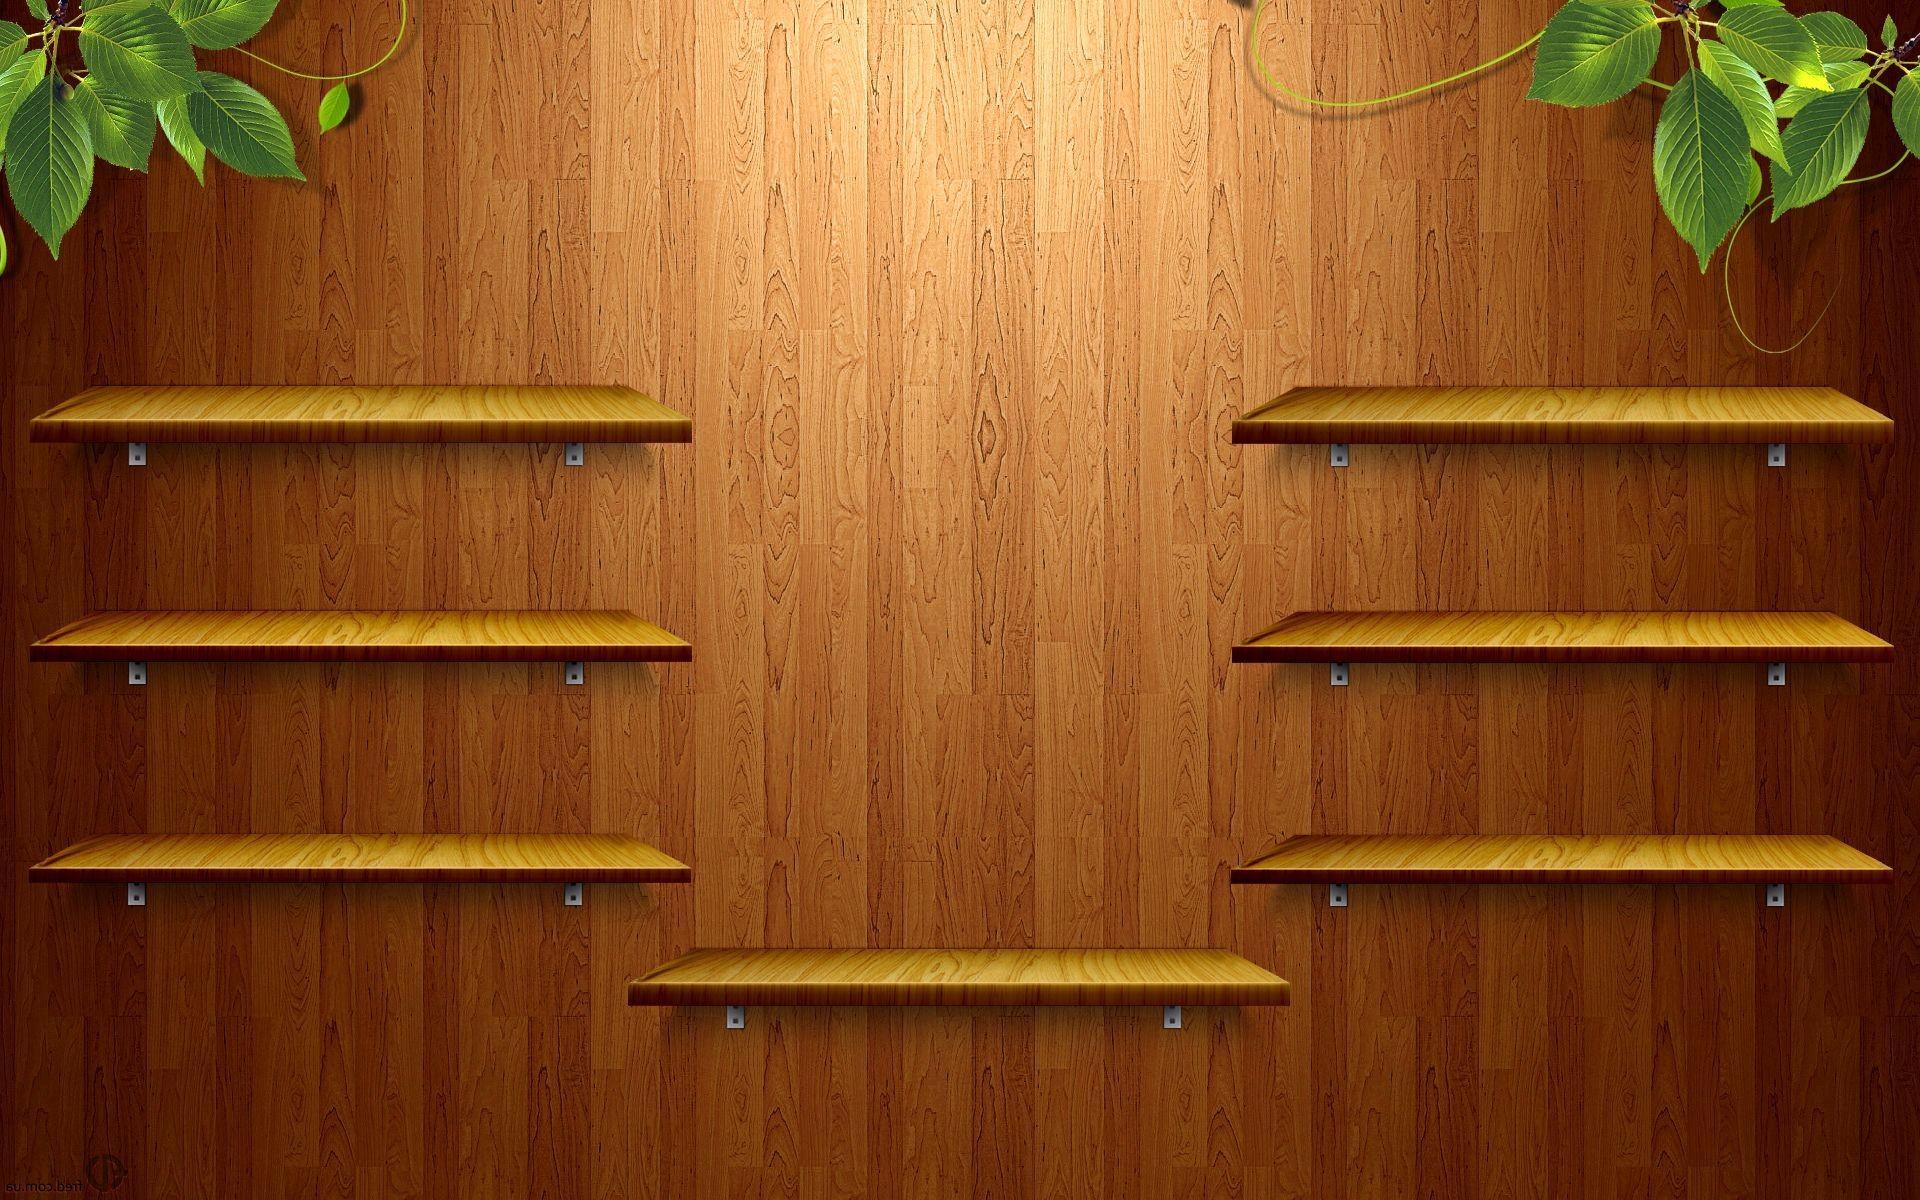 Bookshelf Iphone Wallpaper Shelf Desktop Background 183 ①